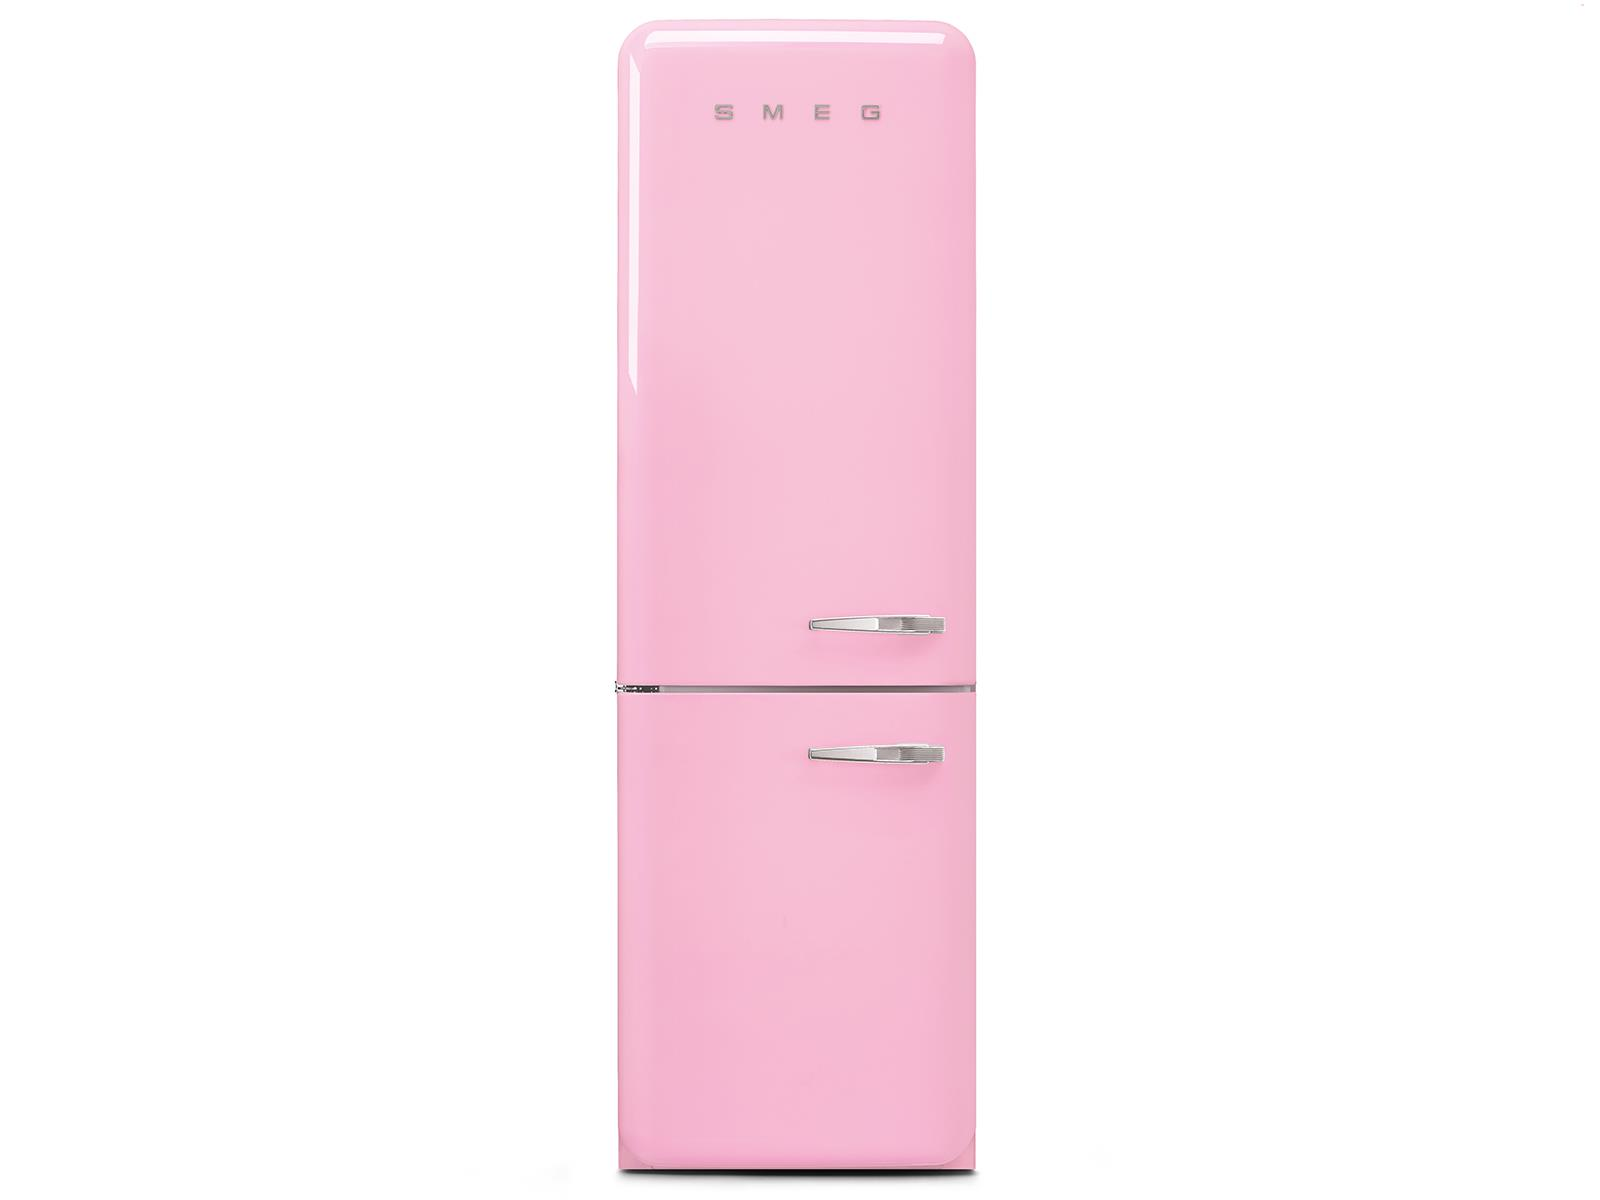 Smeg Kühlschrank French Door : Smeg kühlschrank bedienungsanleitung smeg kühlschrank innen smeg